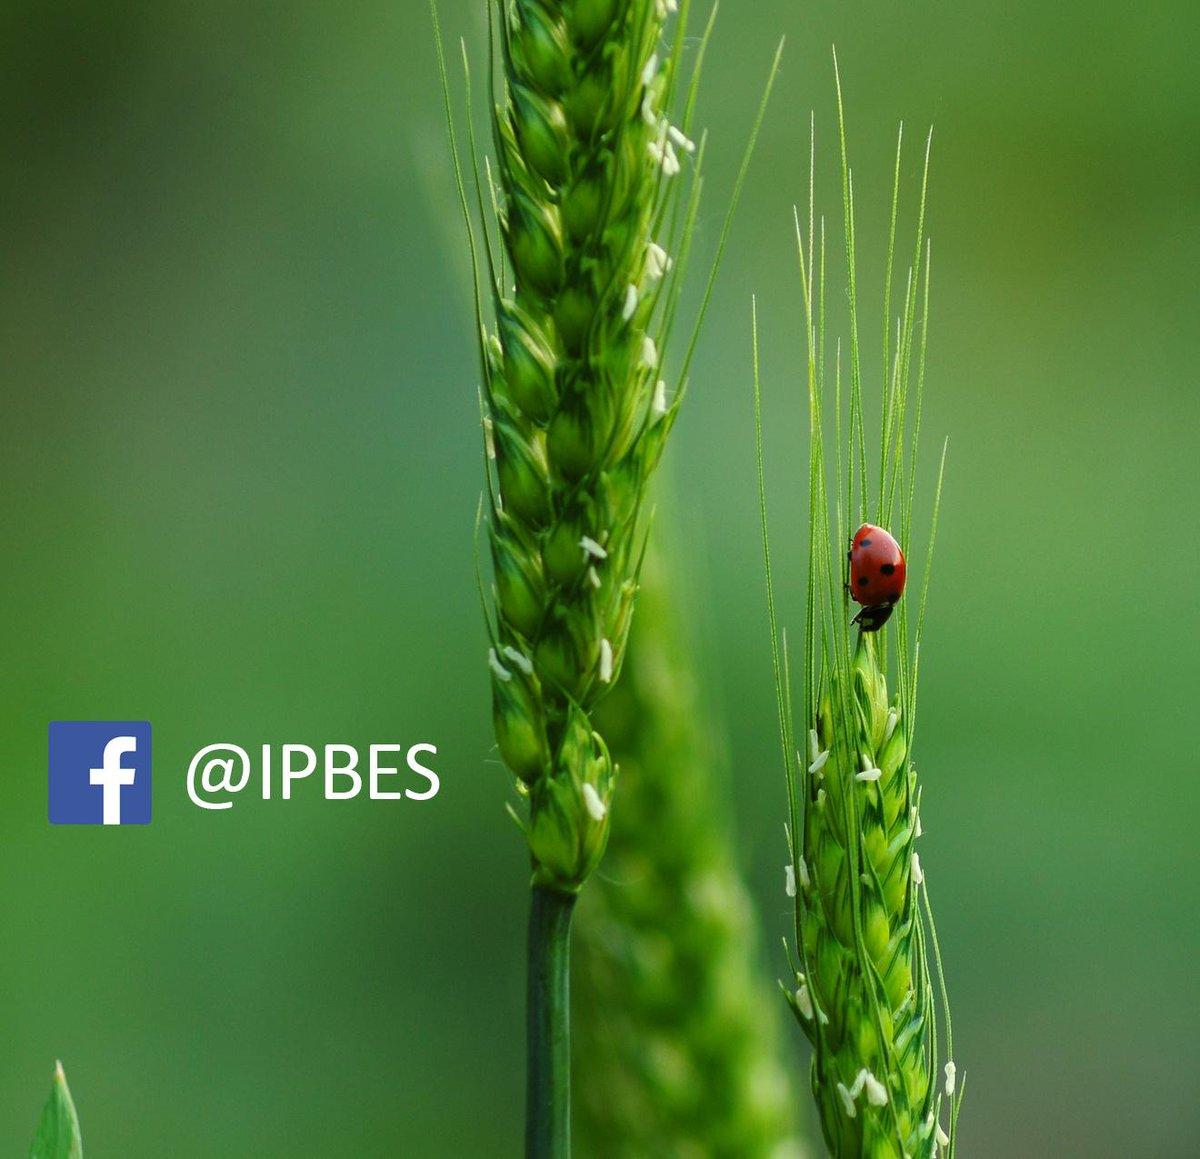 IPBES on Twitter: